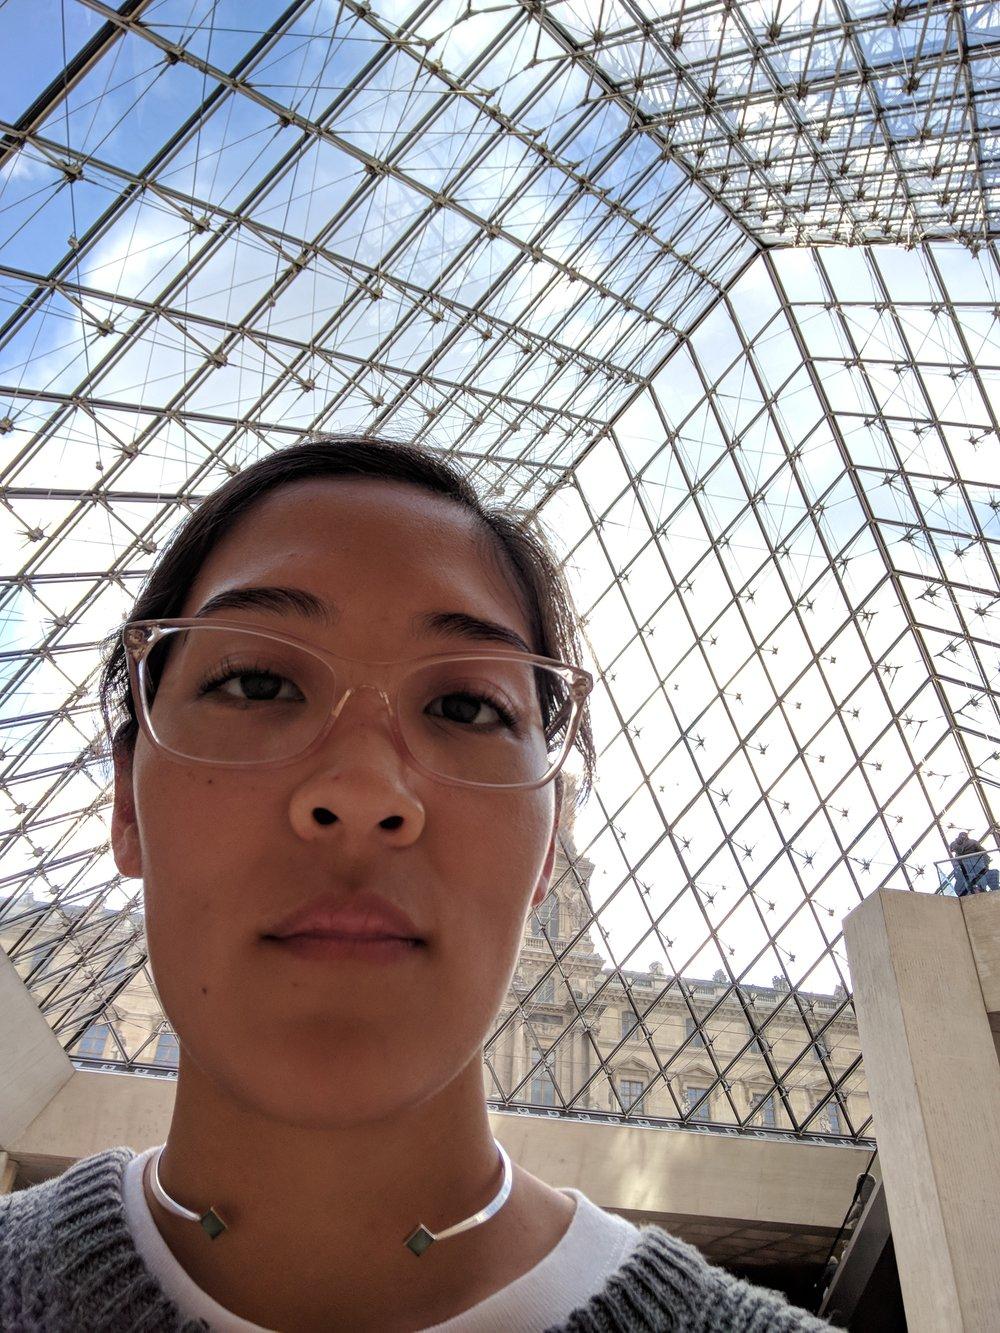 Under I.M. Pei's pyramid